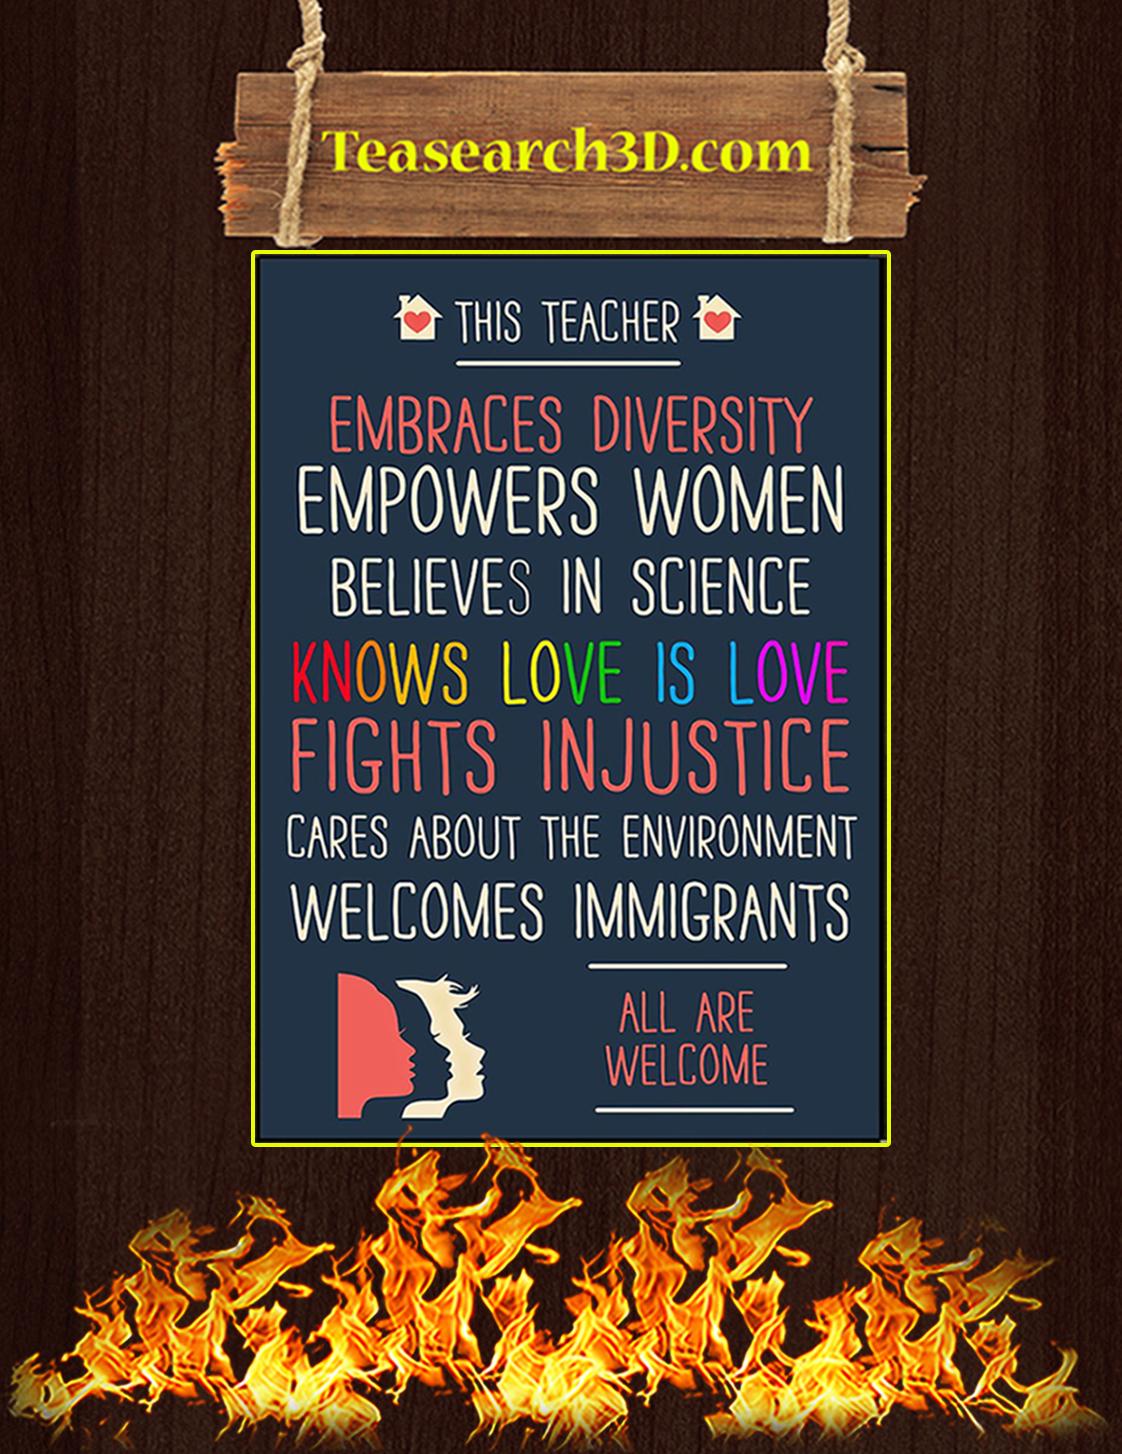 This teacher embraces diversity empowers women poster A3